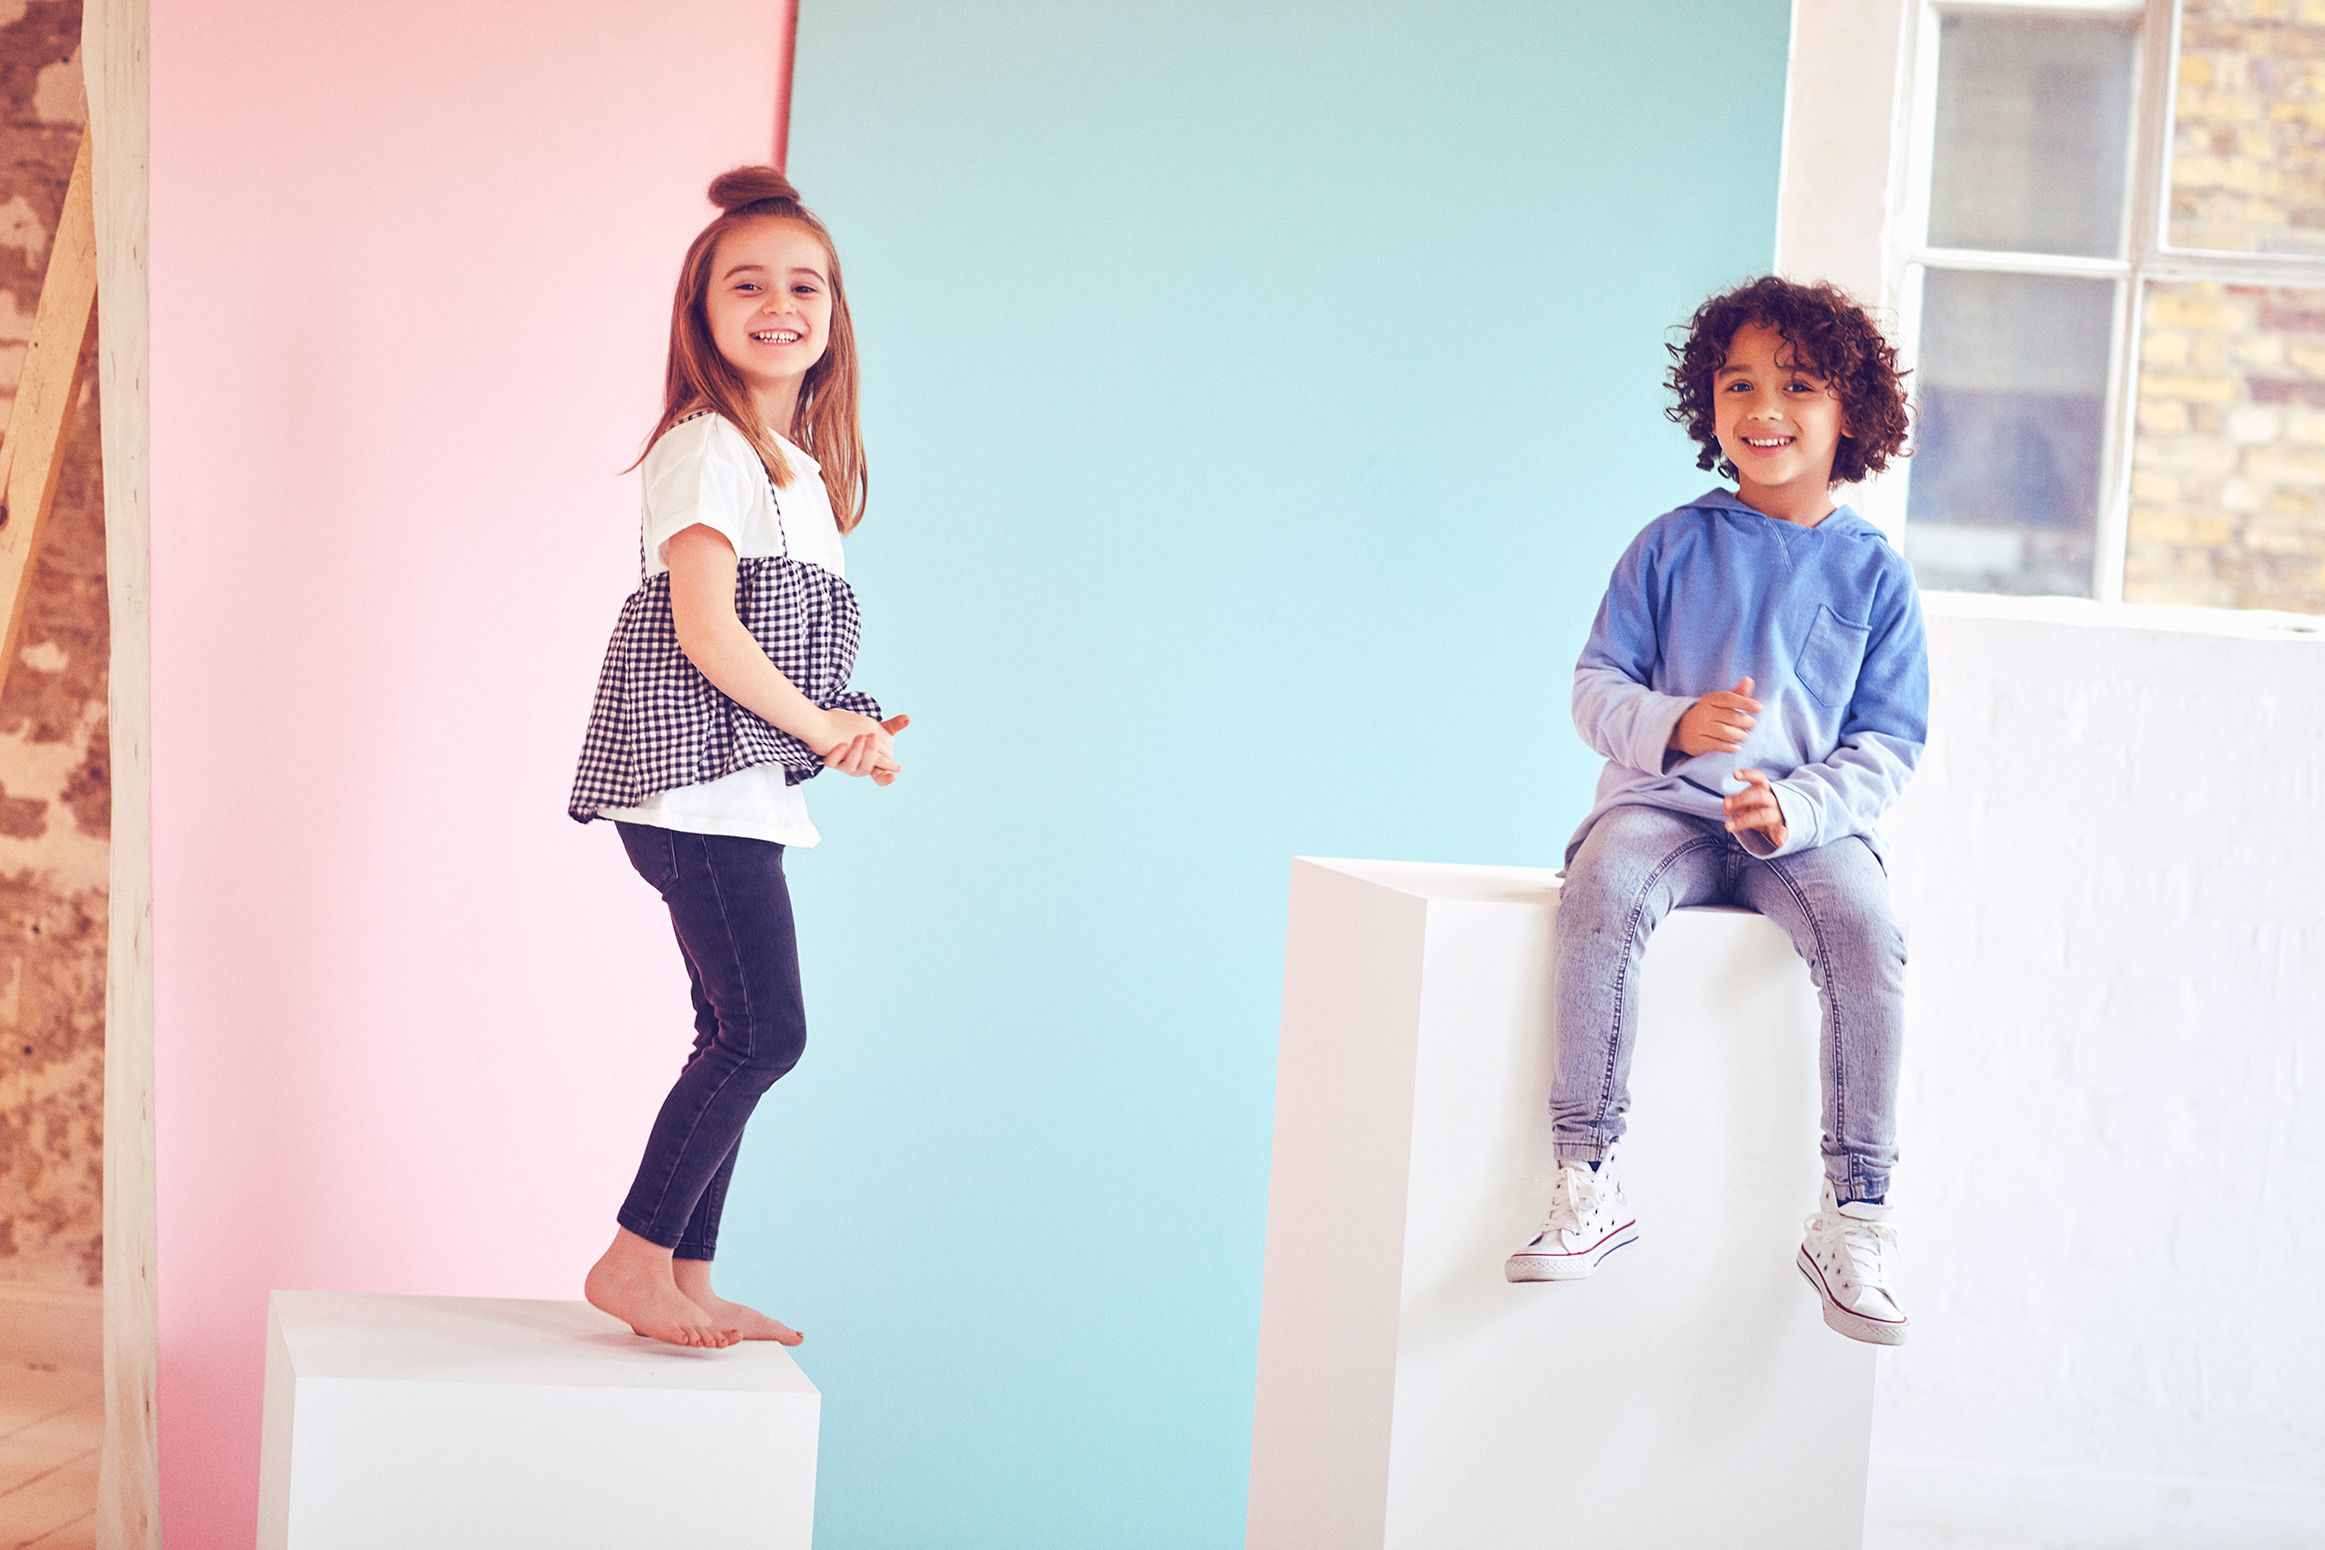 kids-campaign-childrens-fashion-photographer-children2-compressor.jpg